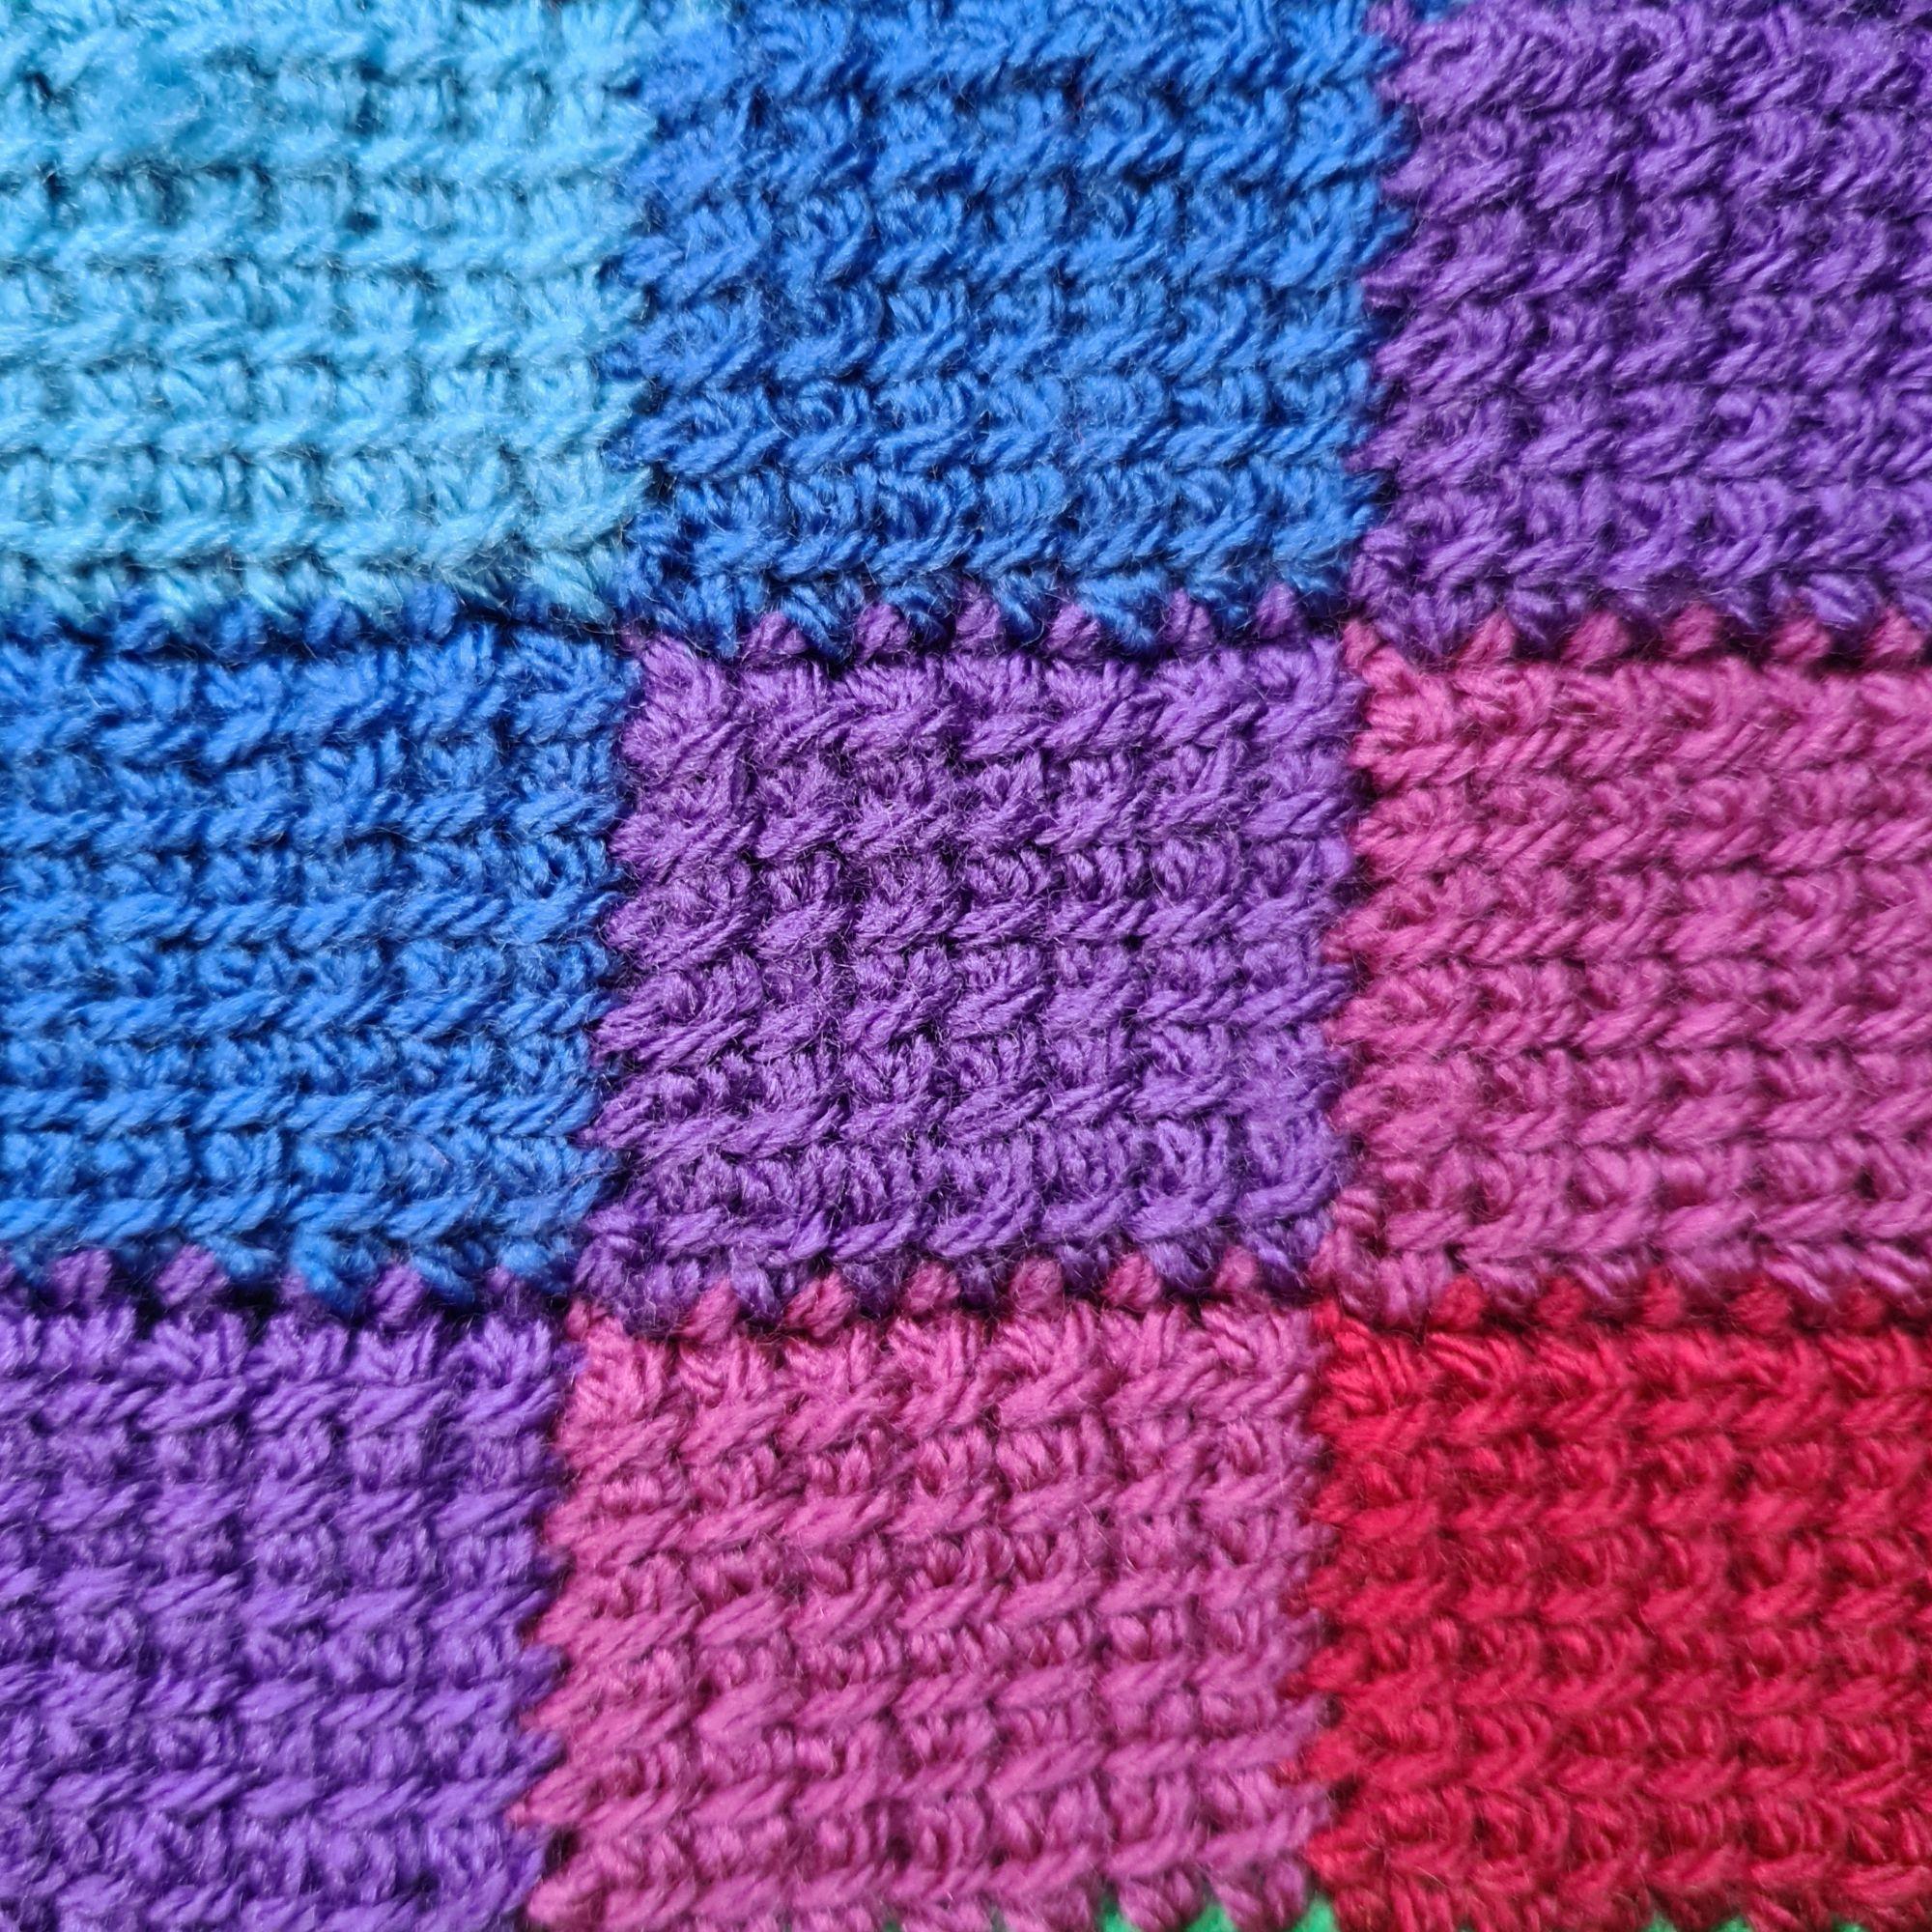 Diana Bensted - Crochet masterclass 9 Tunisian entrelac